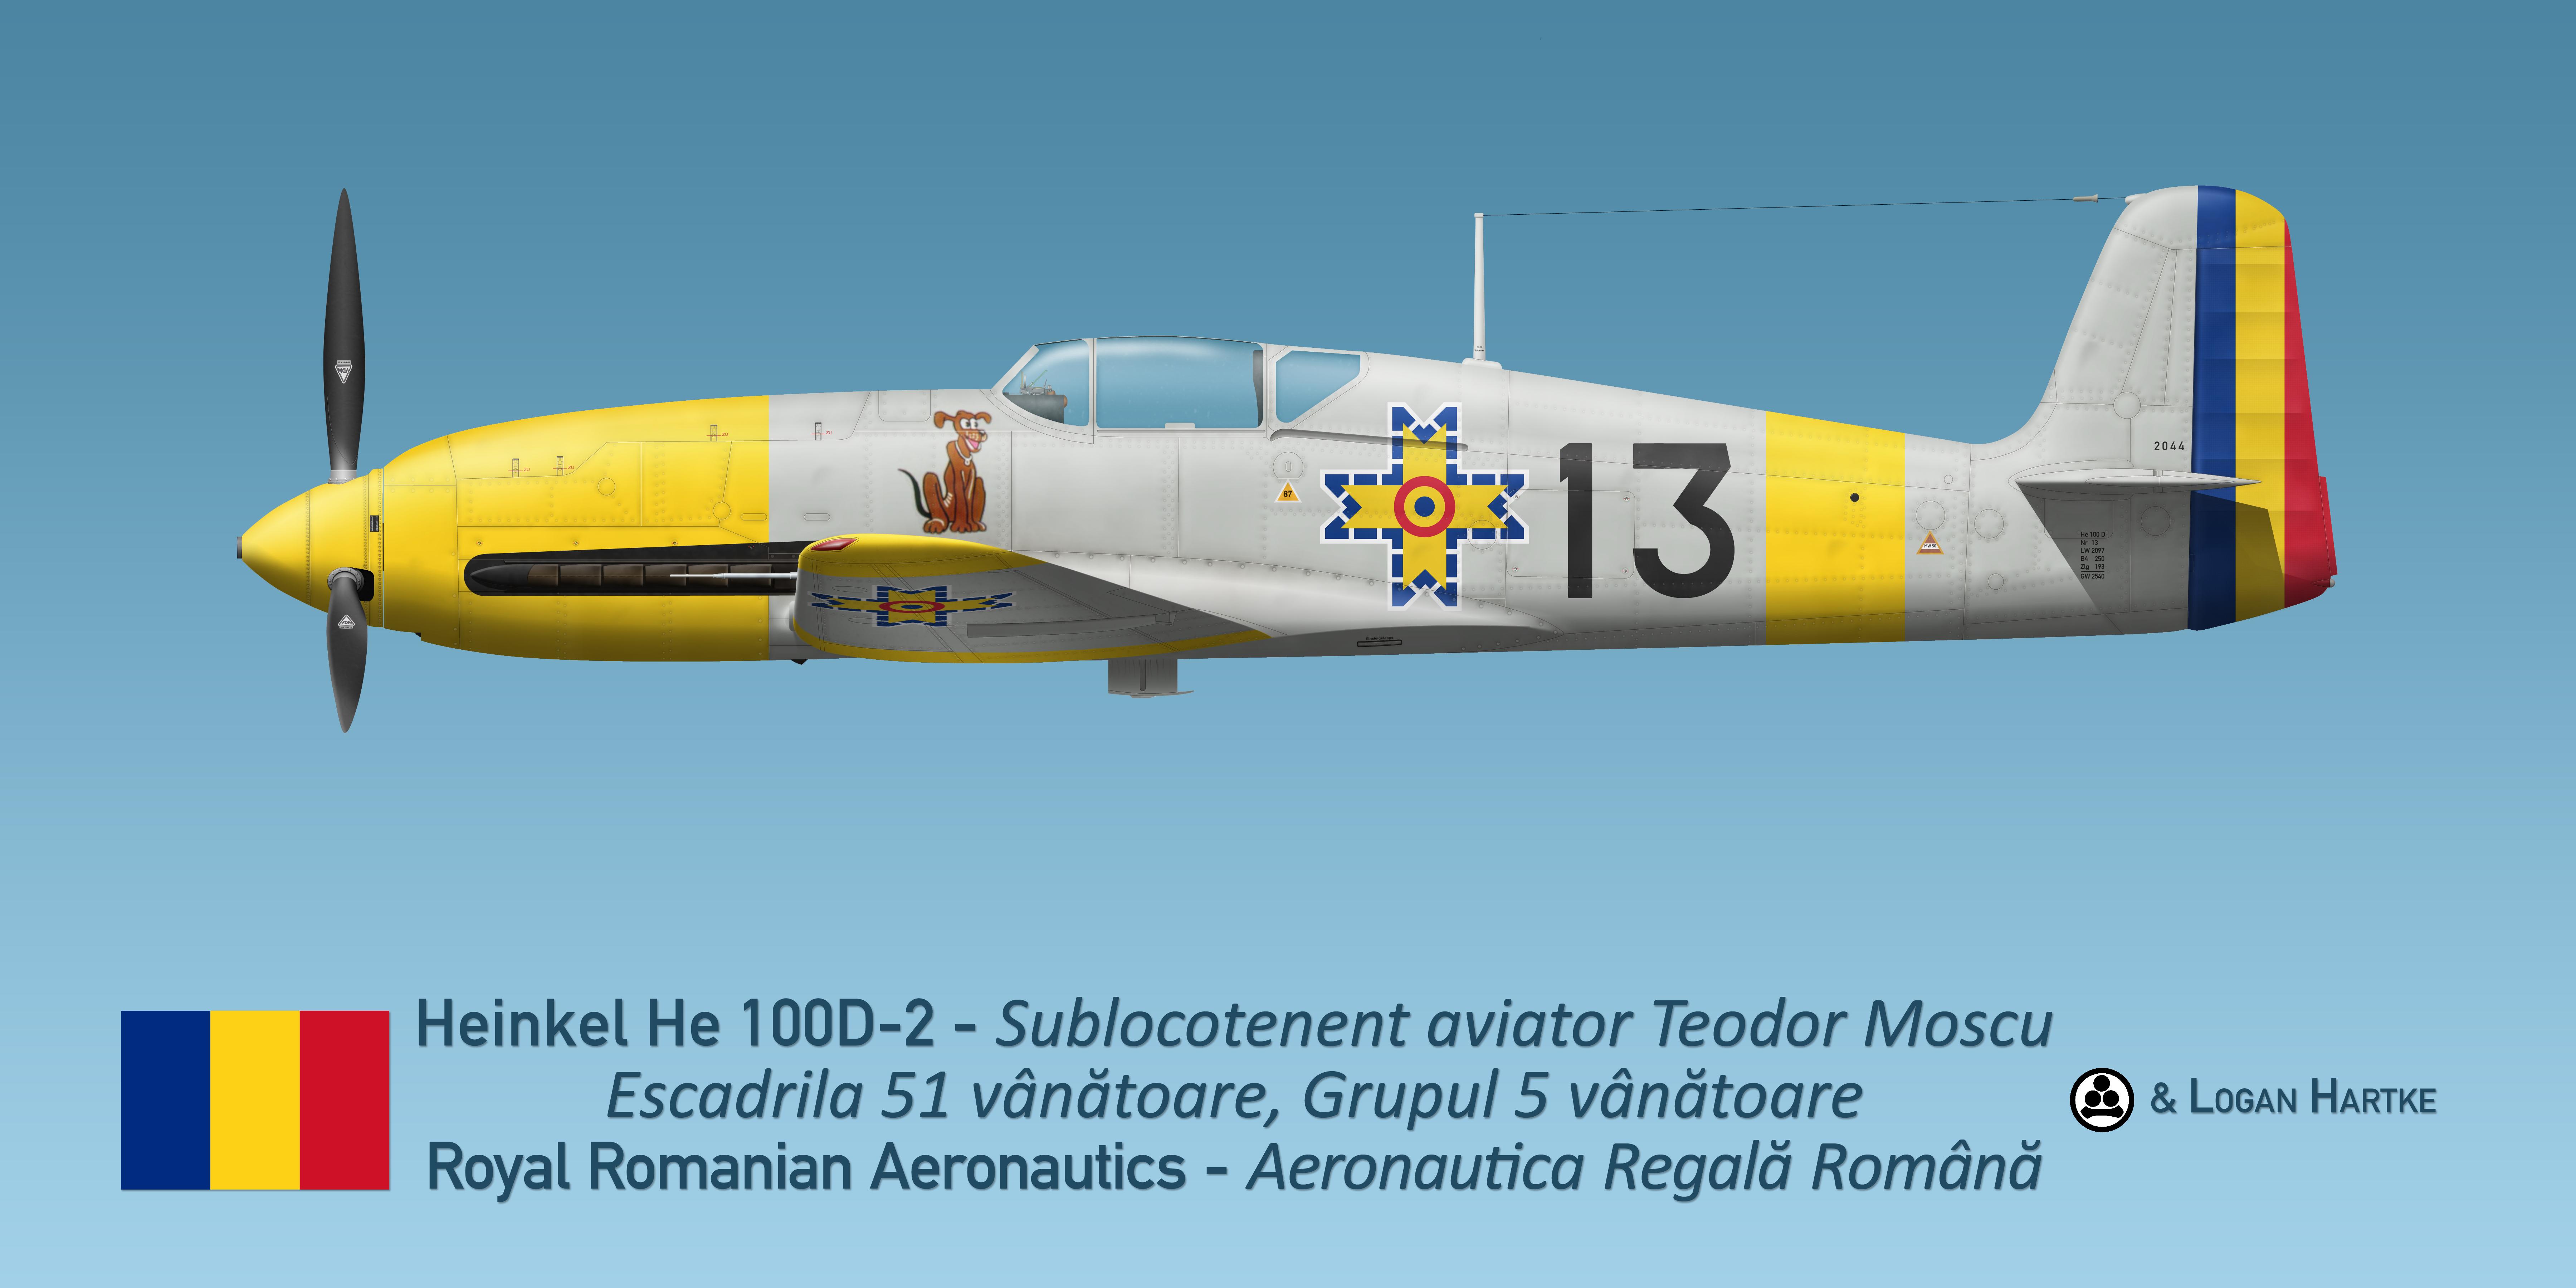 Teodor Moscu's Heinkel He 100D-2